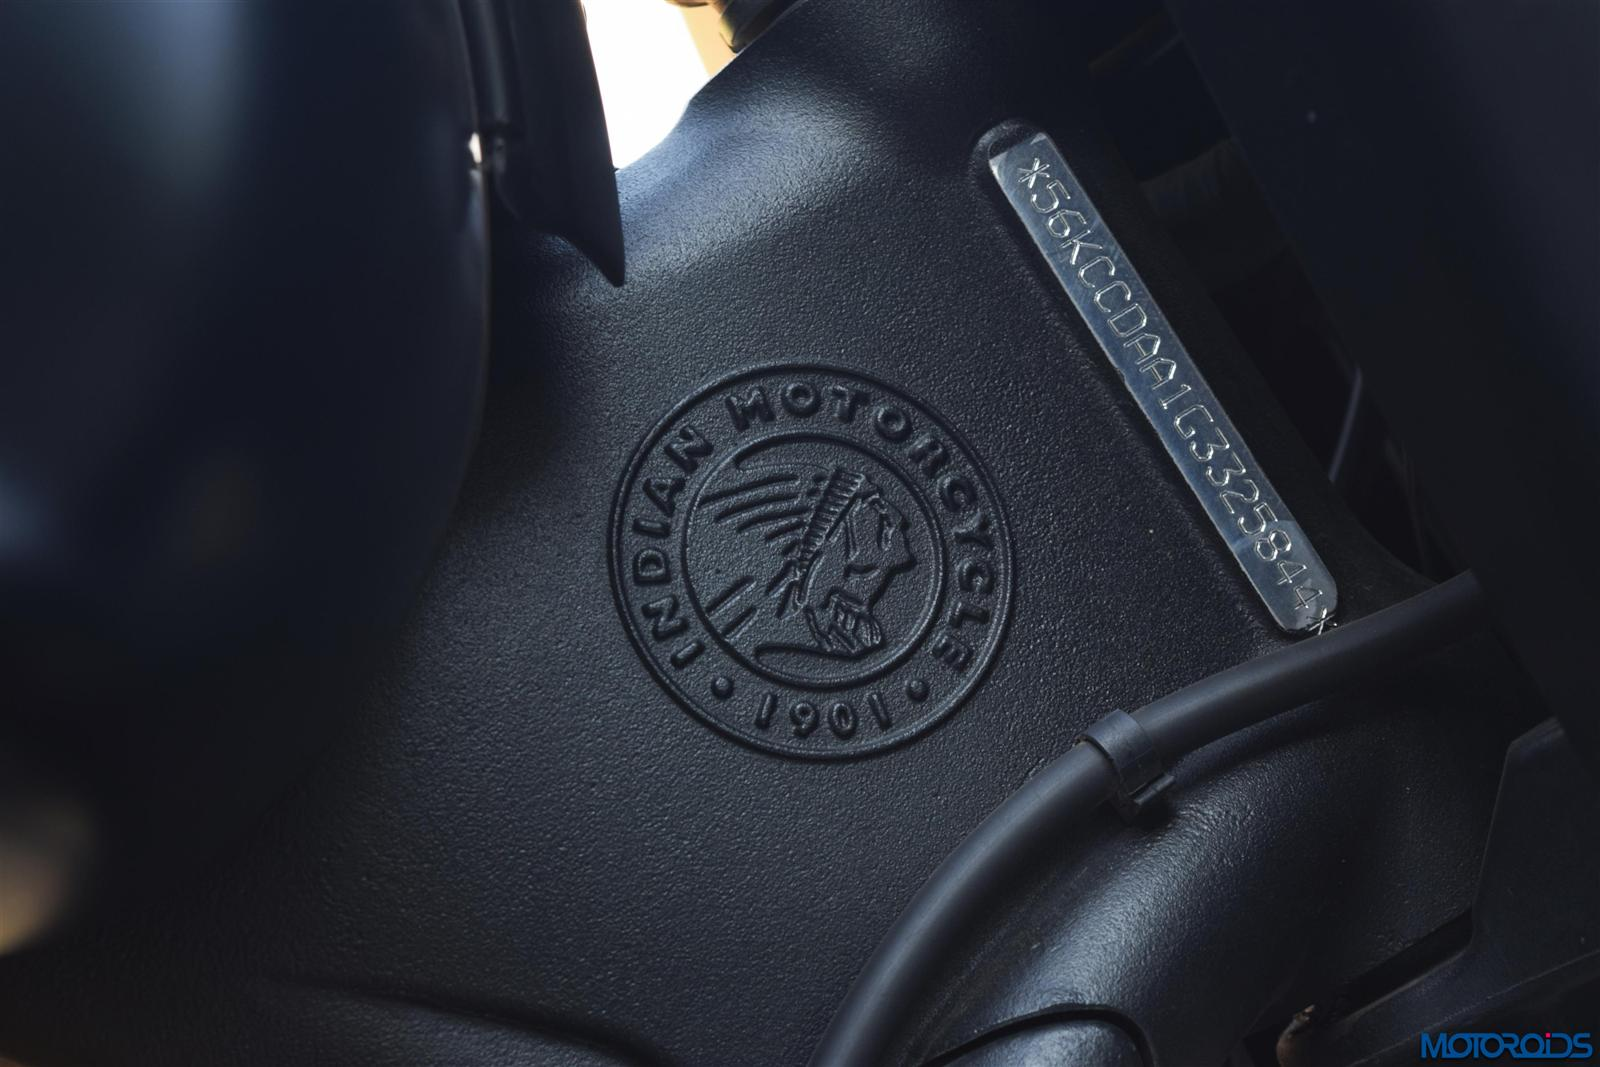 Indian Dark Horse logo on headstock (19)